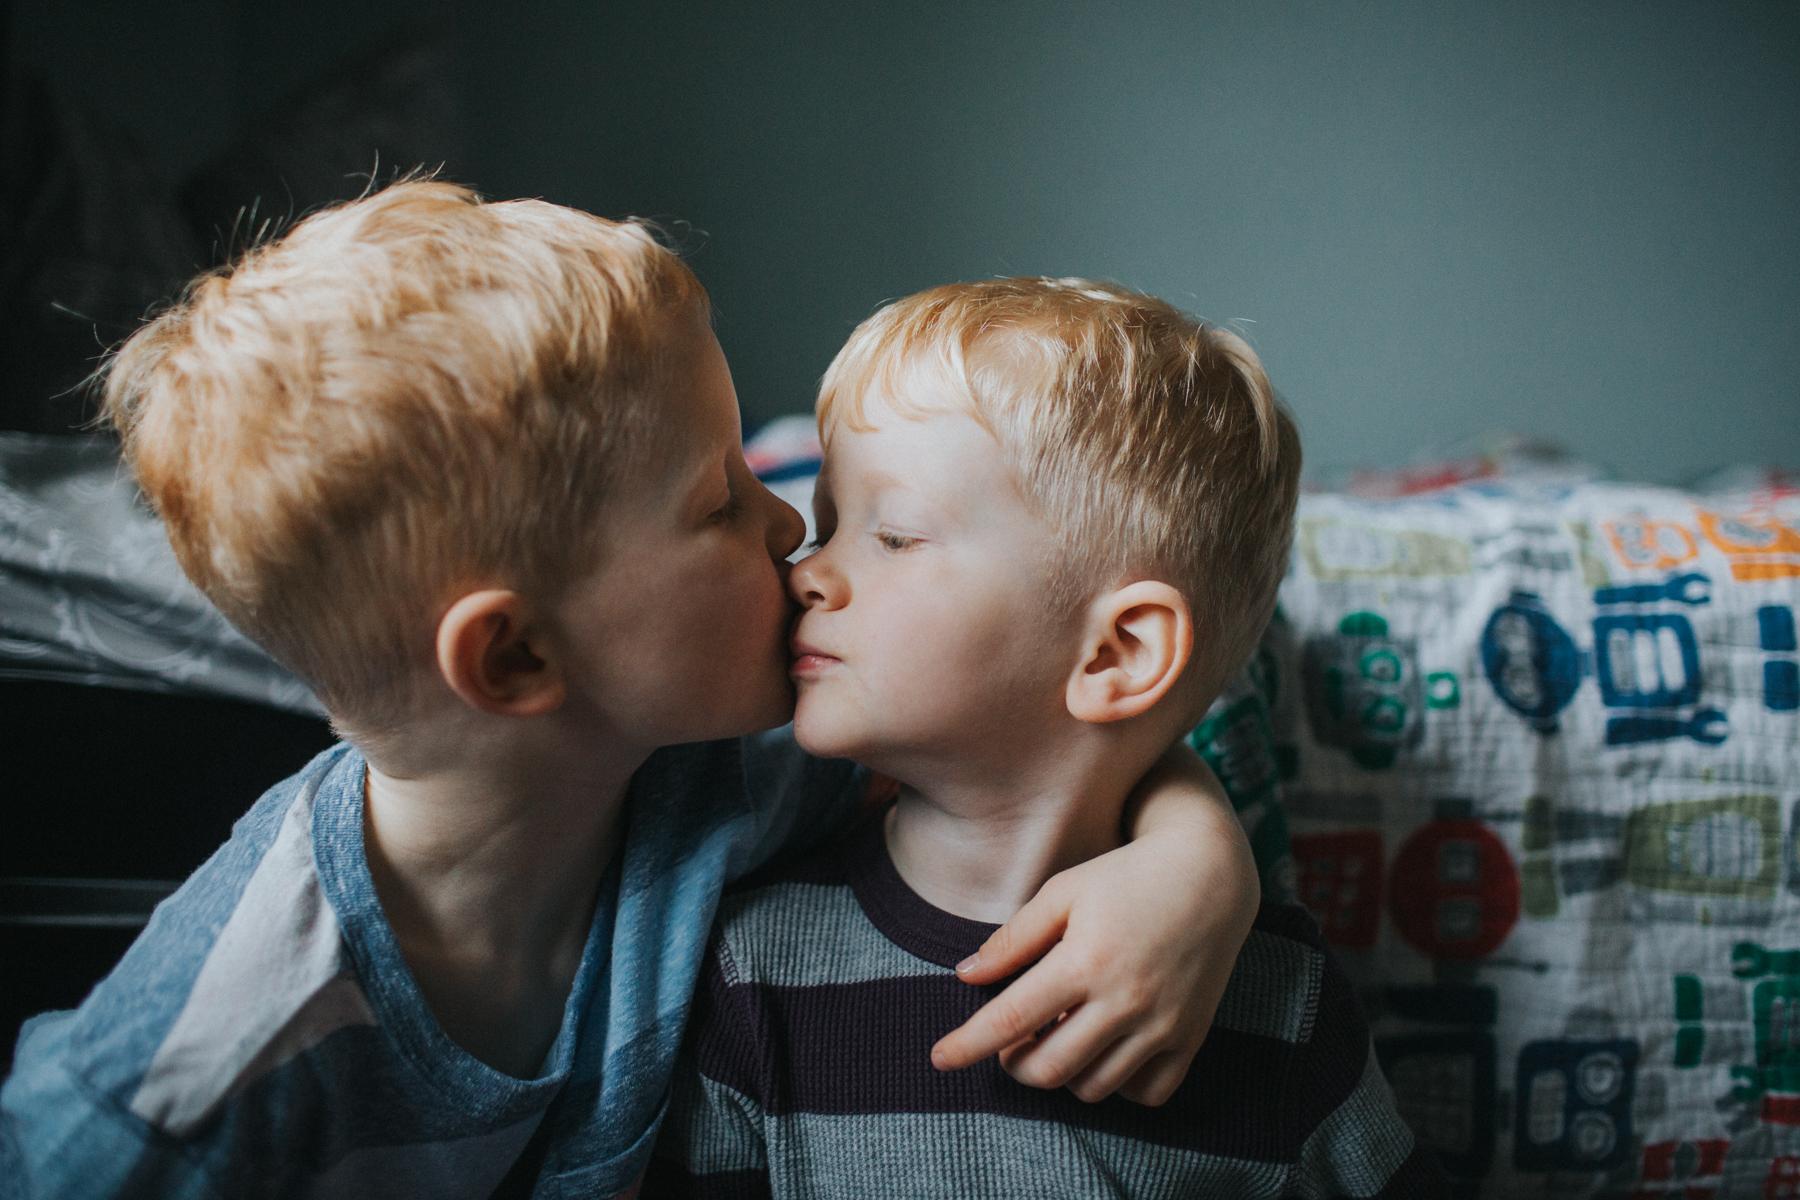 Vancouverfamilyphotography-7521.jpg